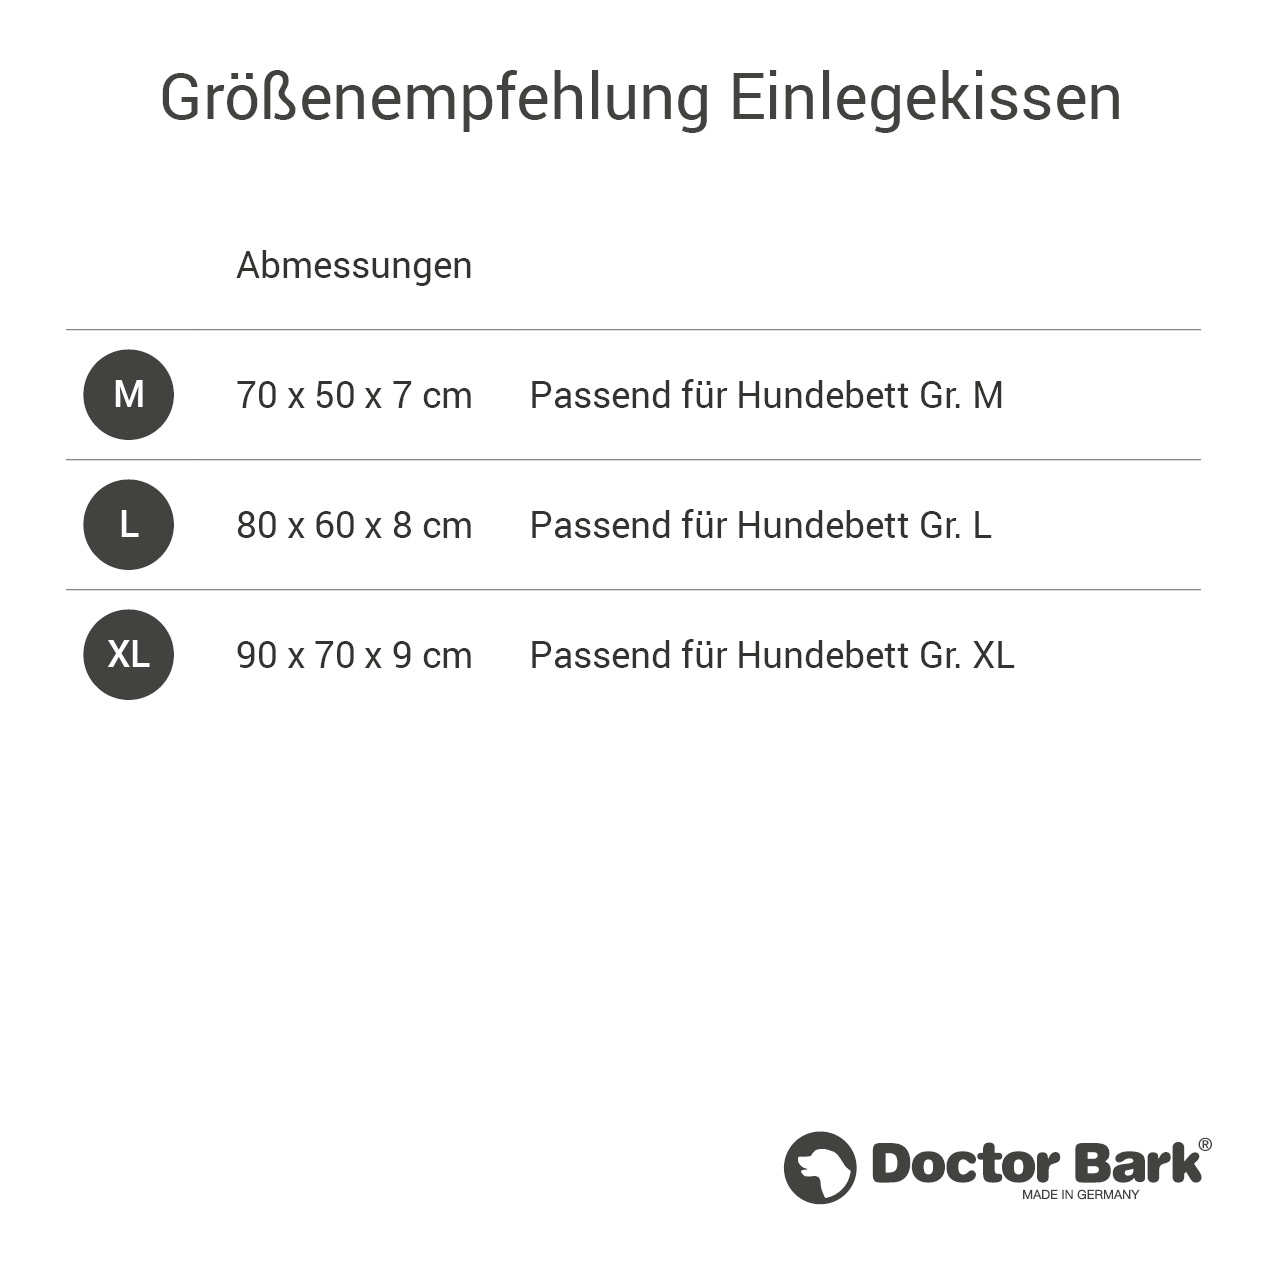 orthopädisches Einlegekissen für Doctor Bark Hundebett Gr. XL - tomate rot